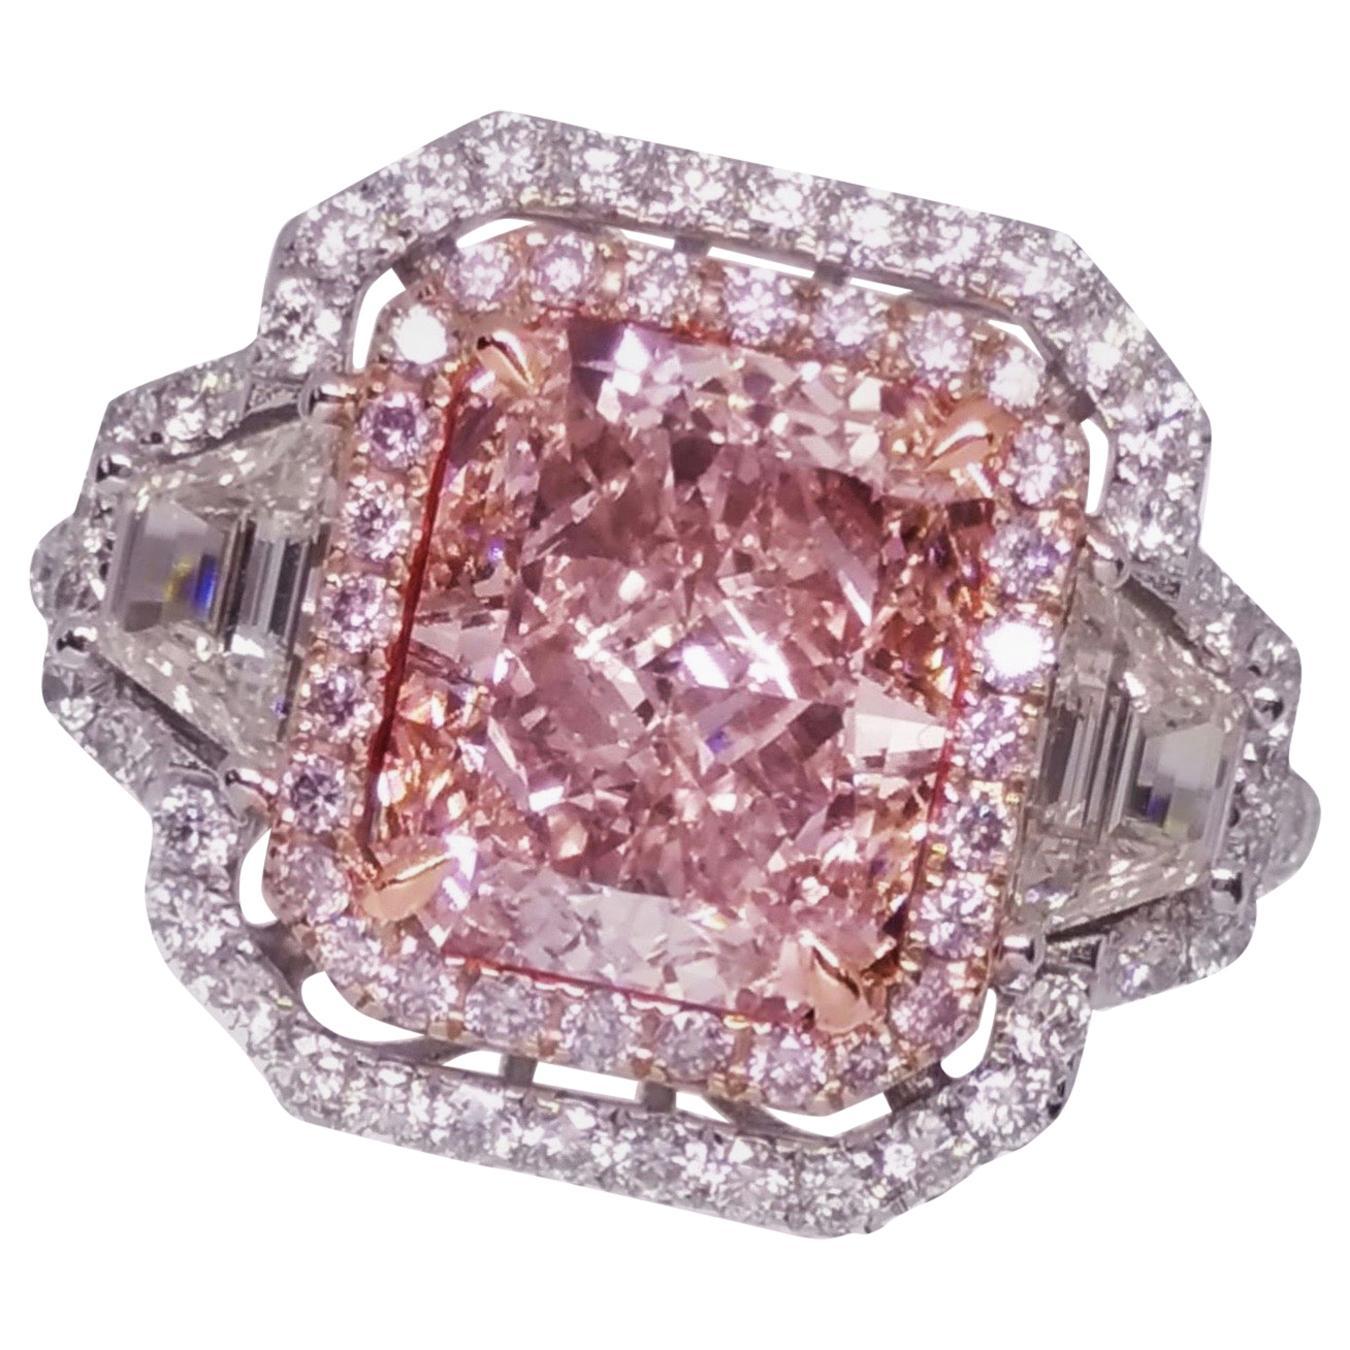 Emilio Jewelry GIA Certified 3.00 Carat Fancy Light Brown Pink Diamond Ring